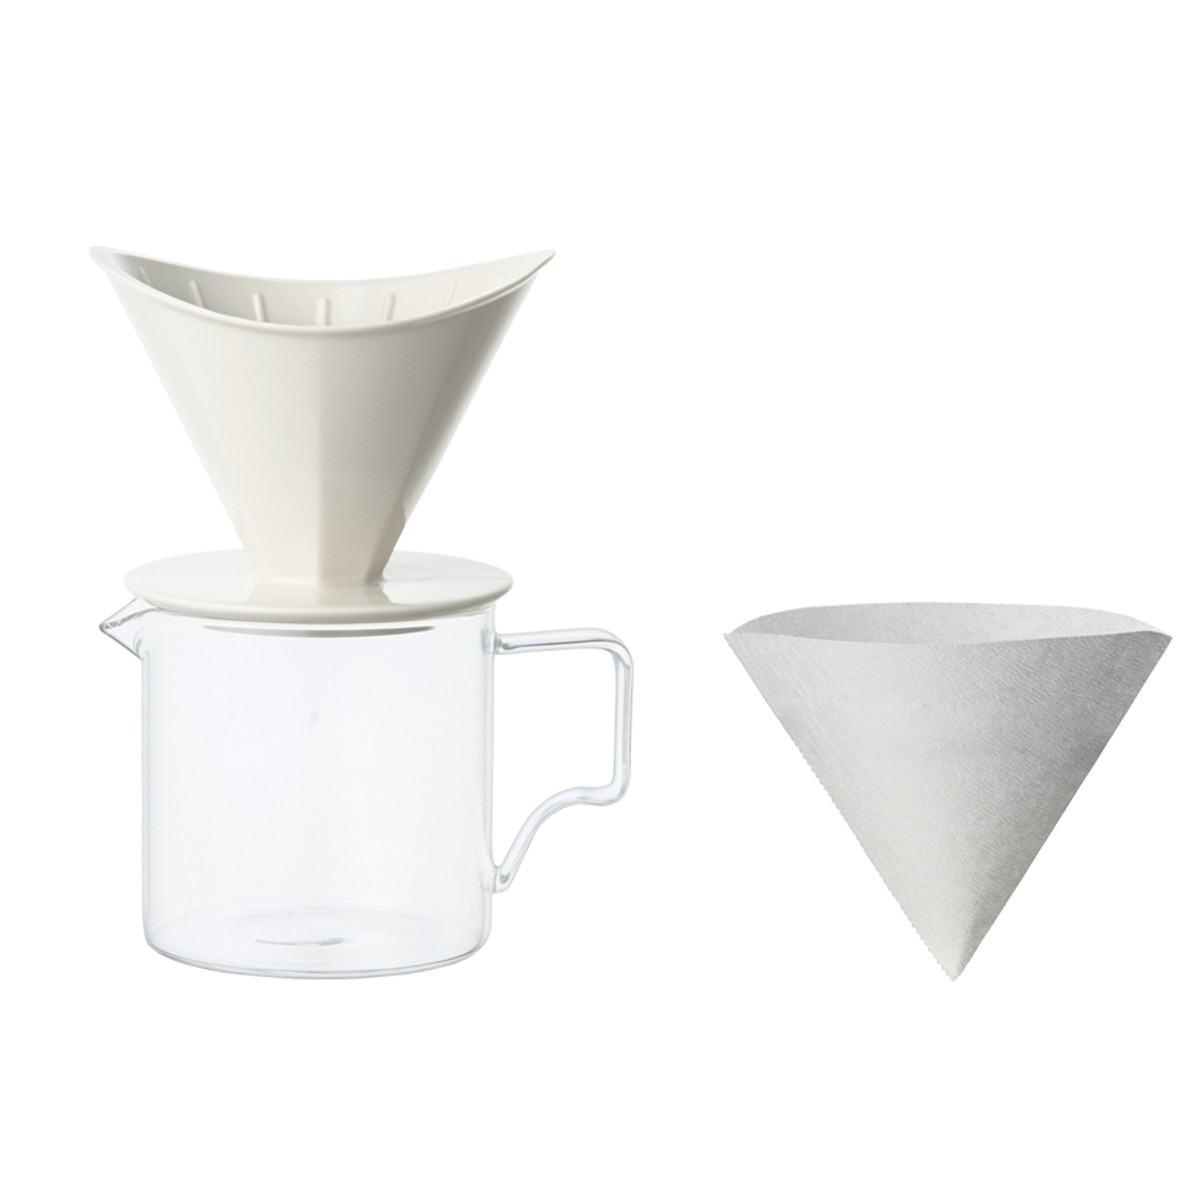 Kinto OCT Brewer Jug Set 2 Cups